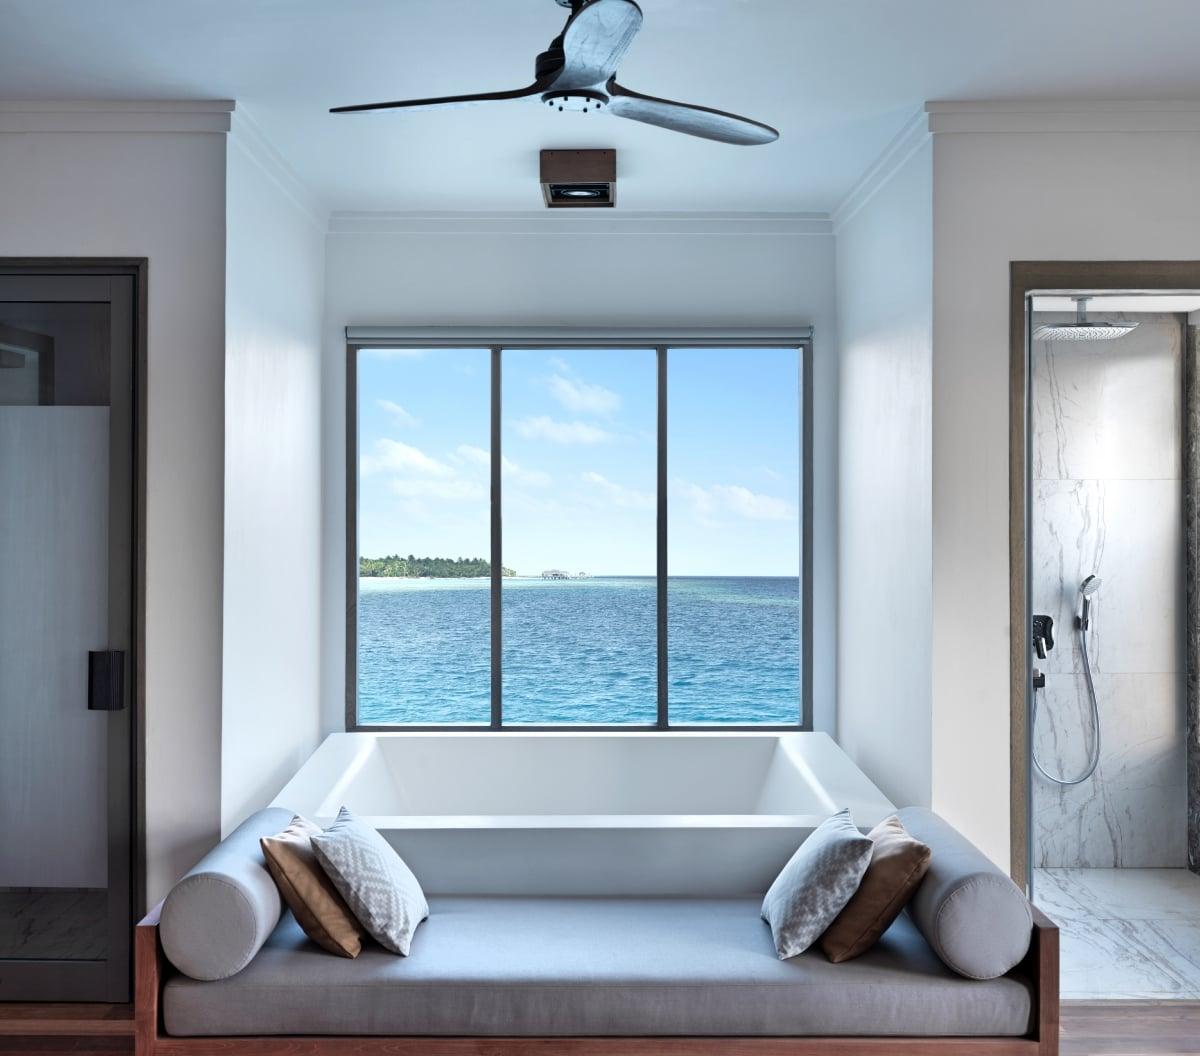 Maldives_Vakkaru_Maldives_Four_Bedroom_Over_Water_Residence_fivestardestination__five_star_destiantion_3